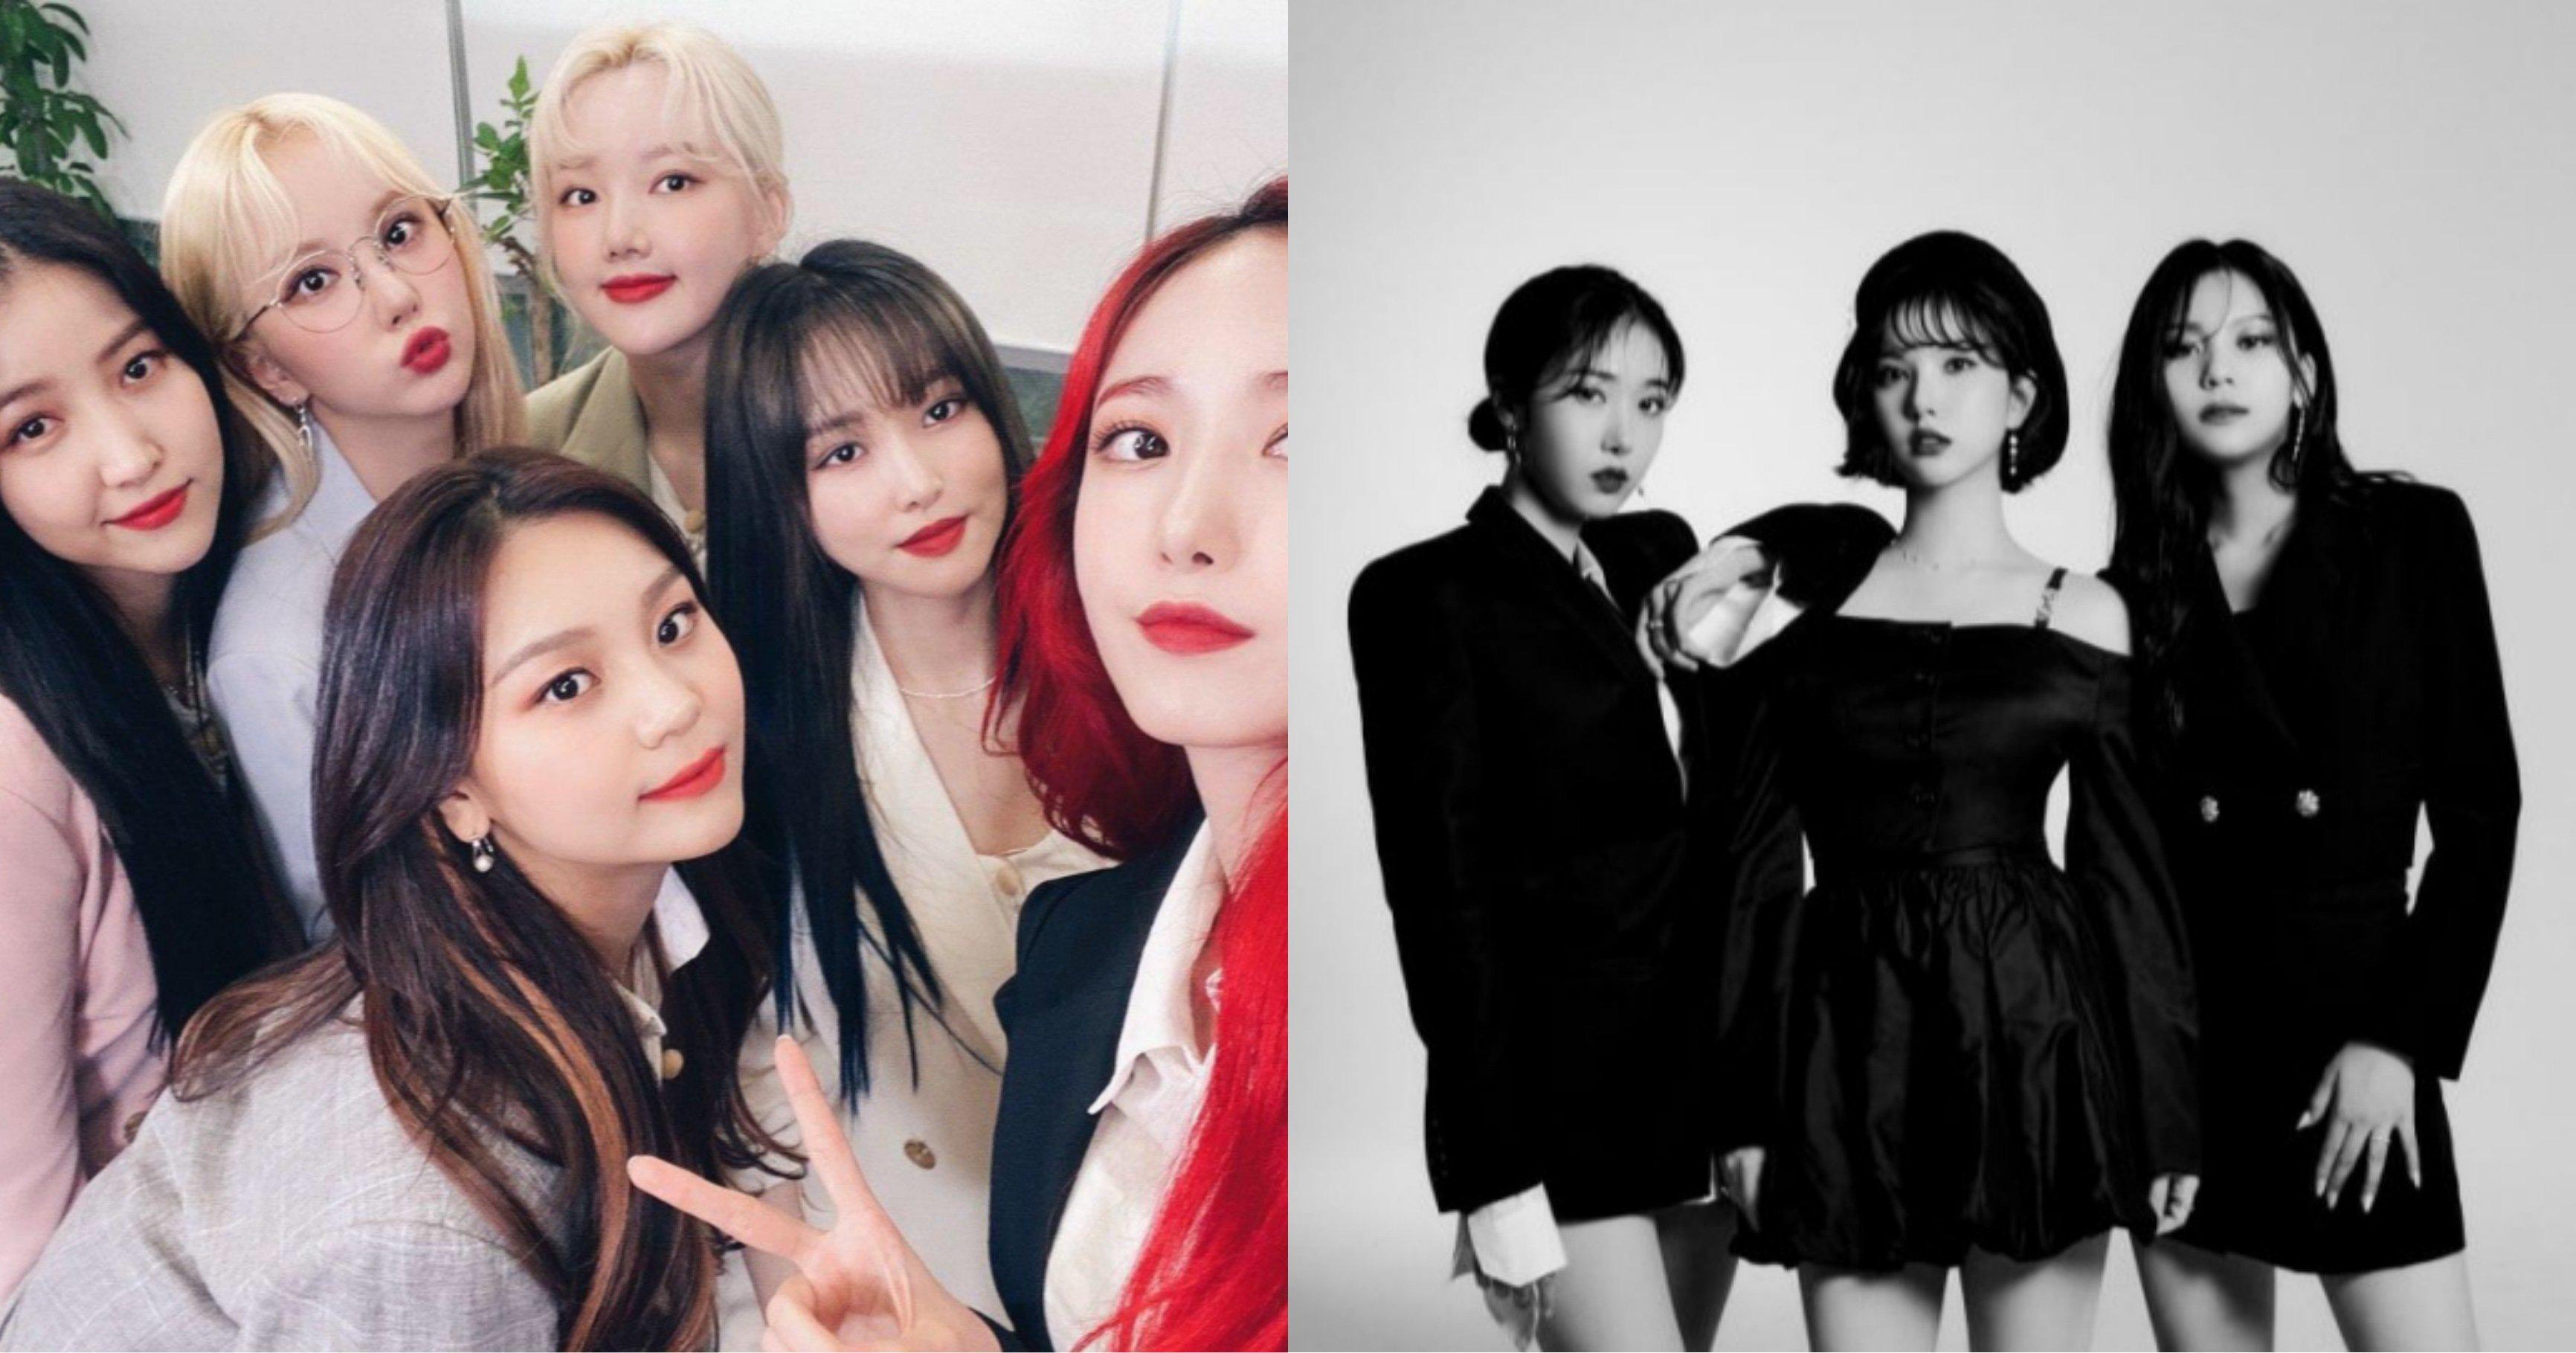 kakaotalk 20211006 232039121.jpg?resize=412,232 - 새로운 이름으로 재데뷔 소식 전한 걸그룹 '여자친구 멤버 3명'